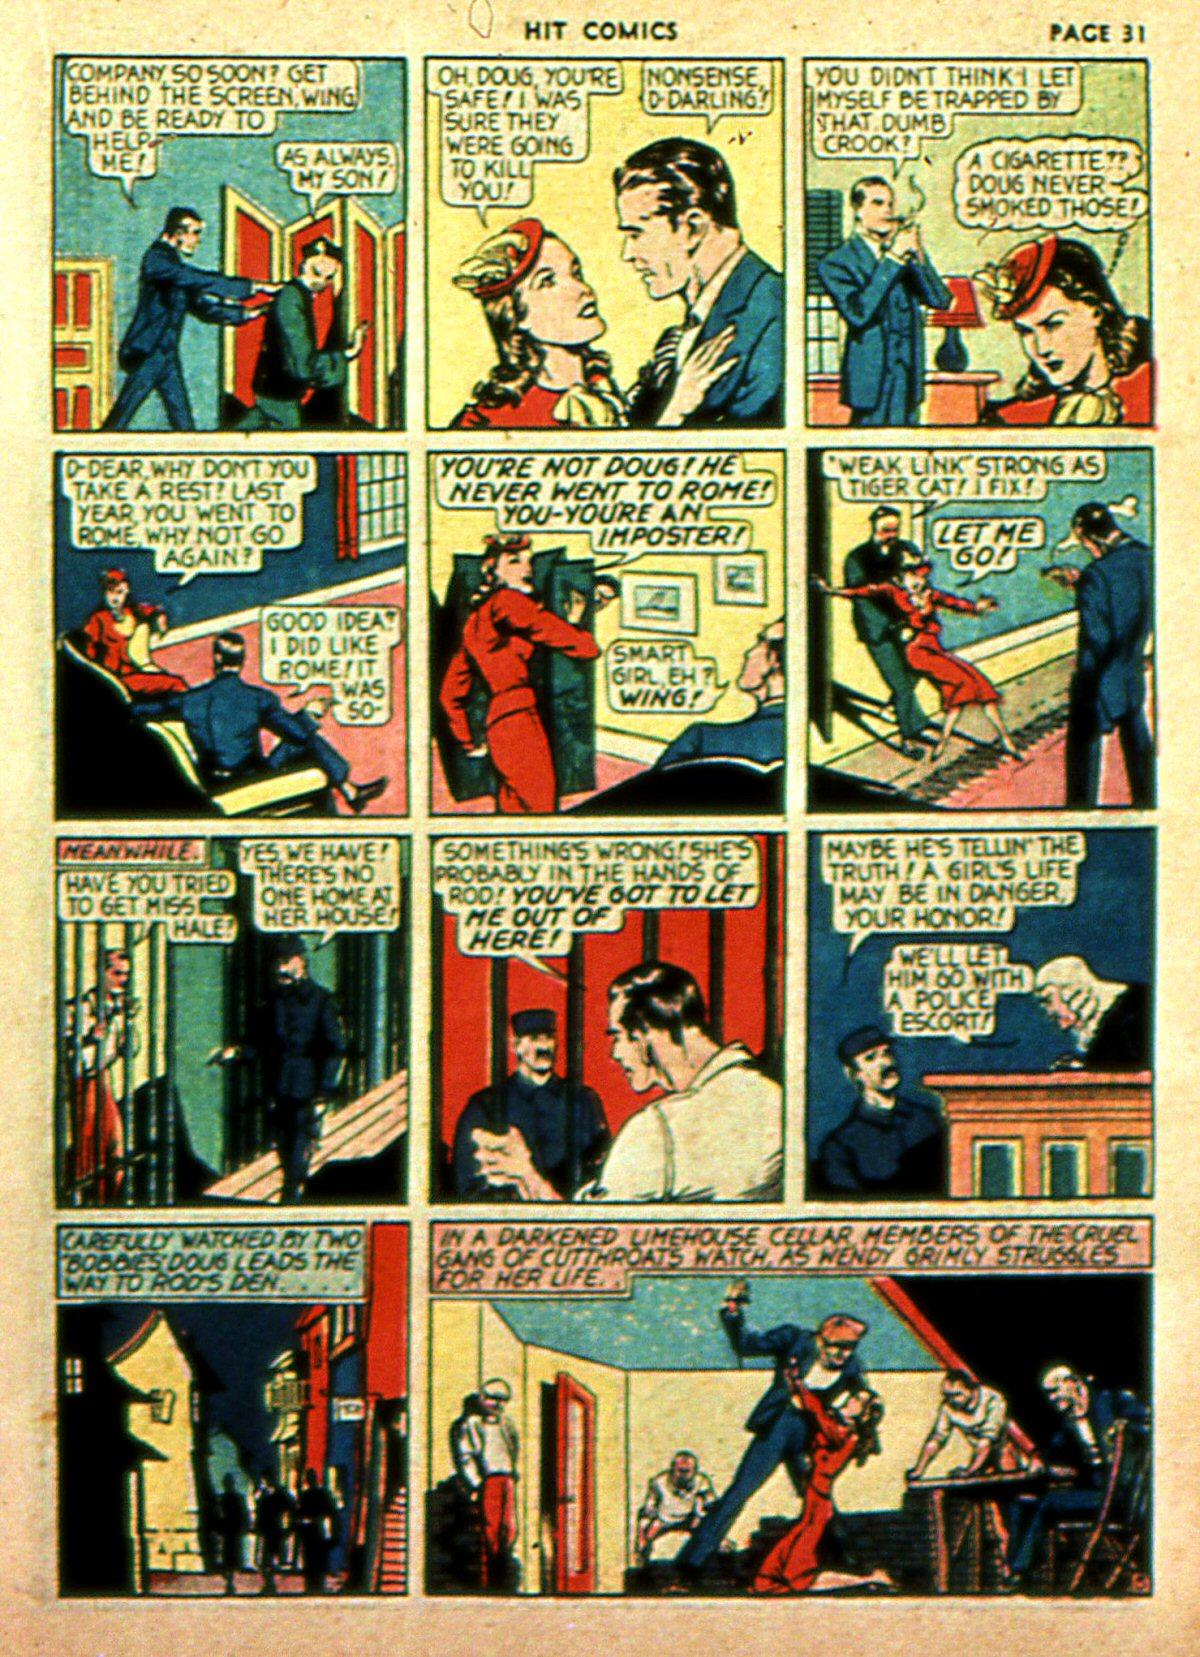 Read online Hit Comics comic -  Issue #2 - 33